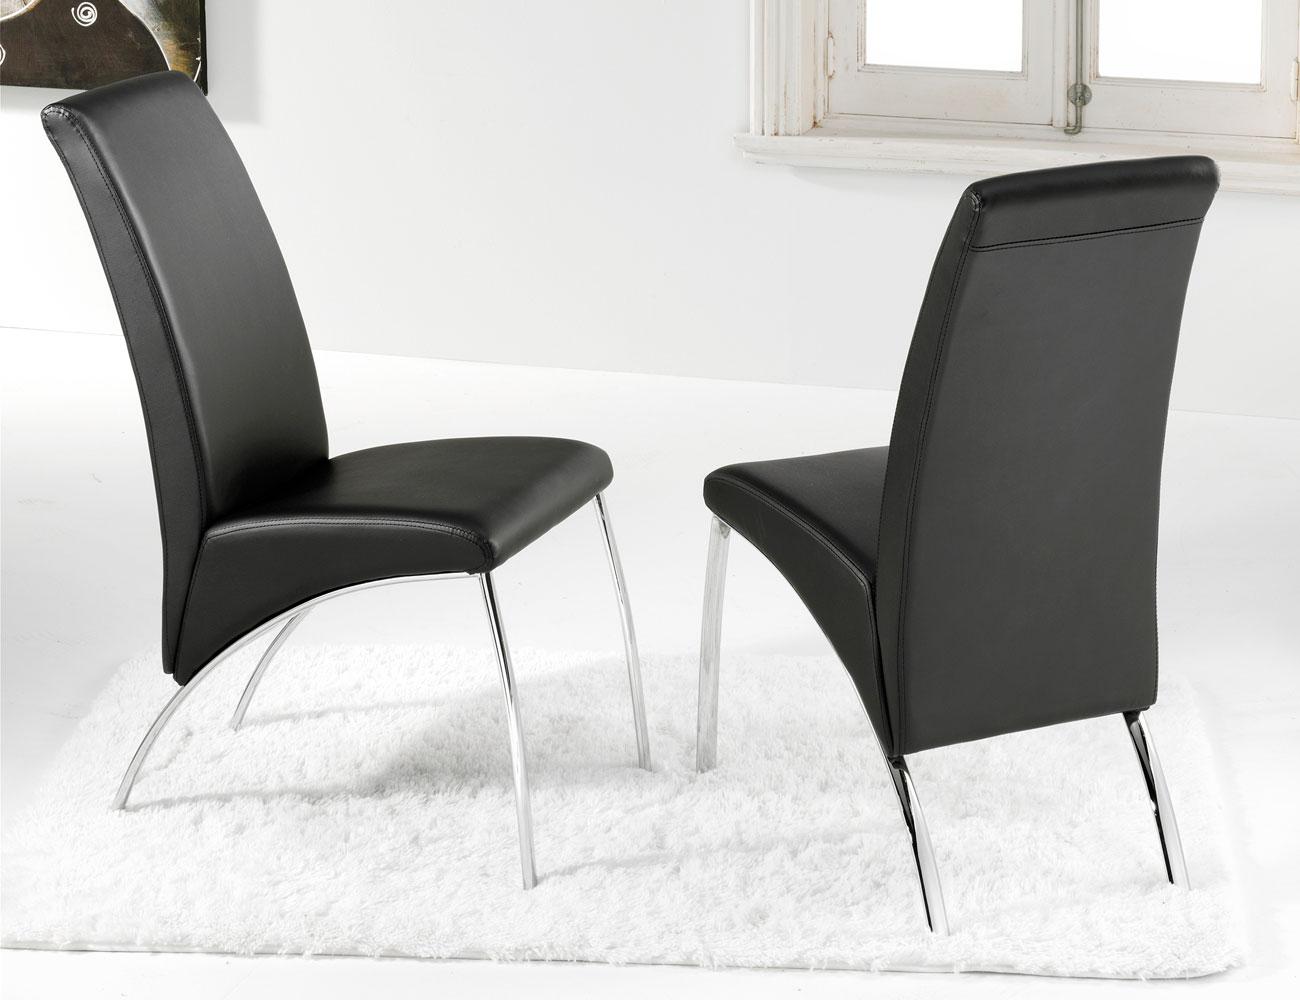 Silla comedor polipiel negro patas cromadas